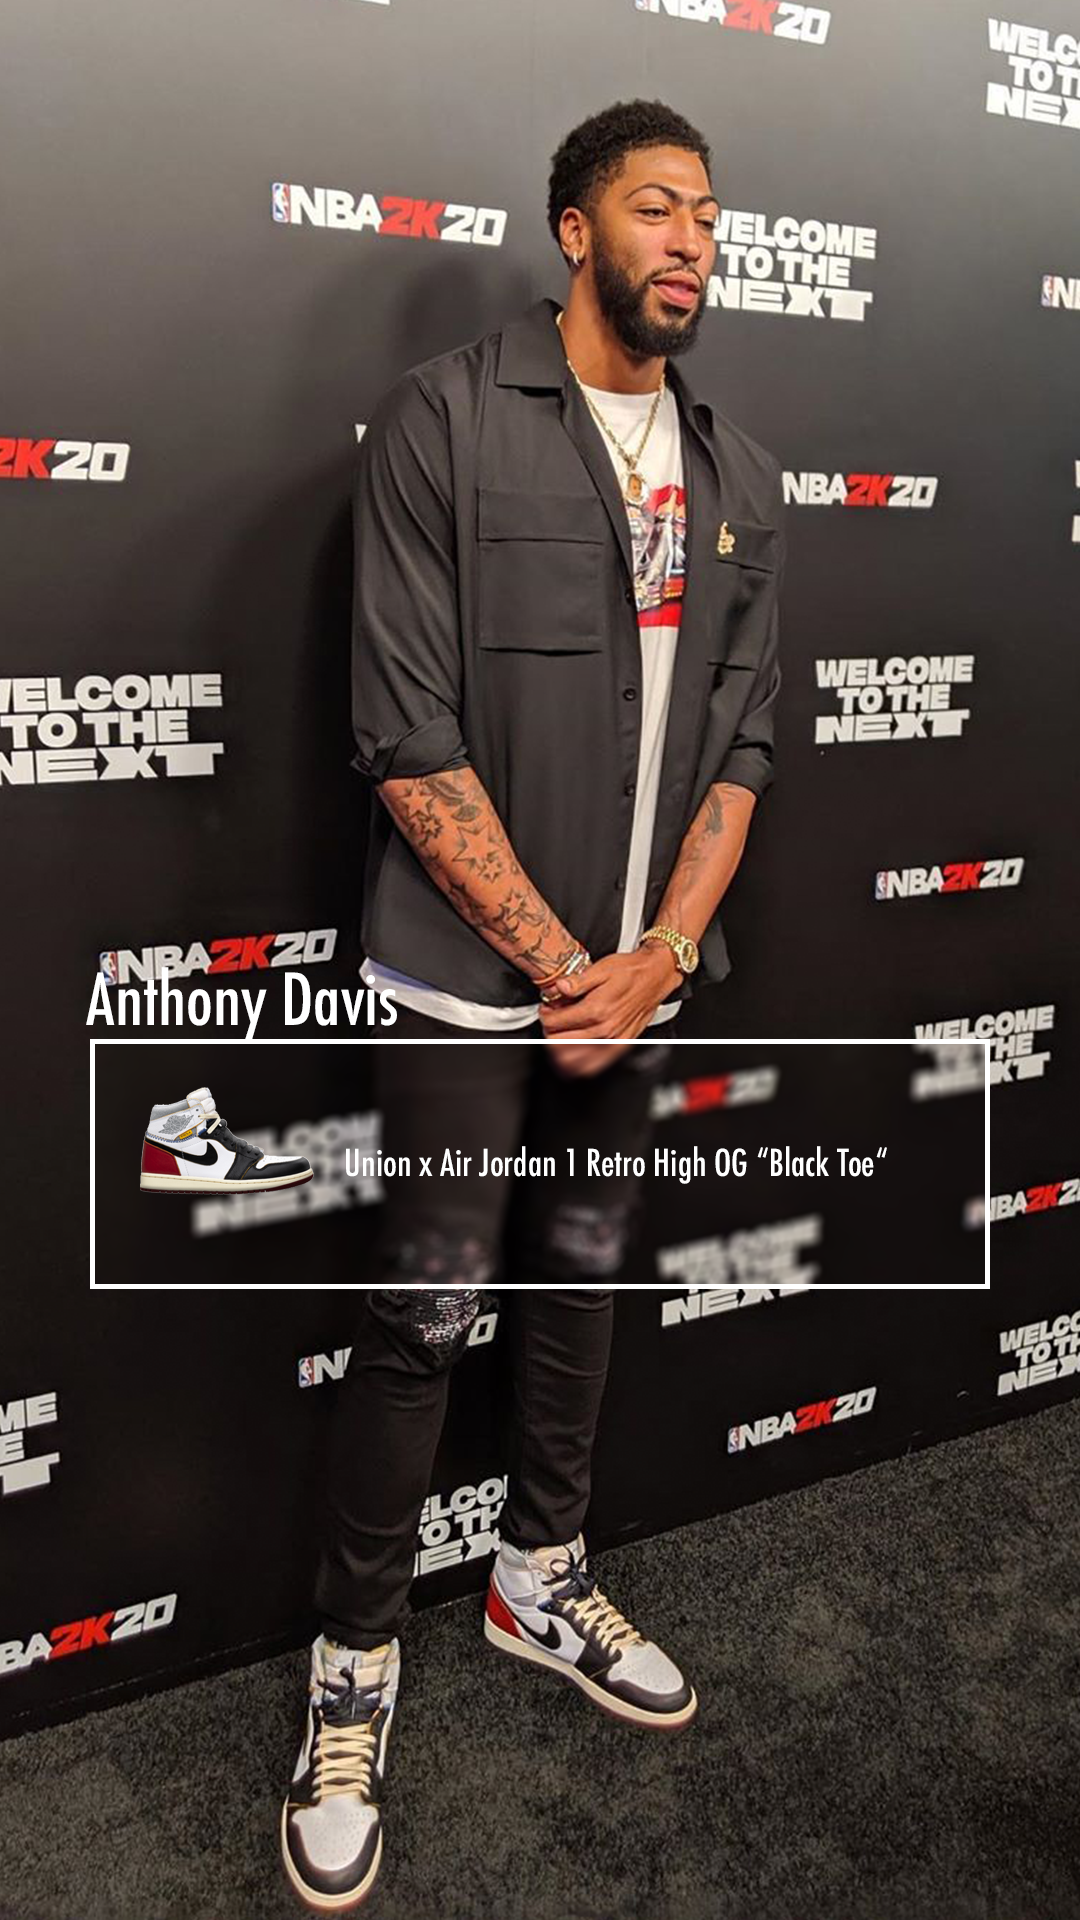 Anthony Davis: Union x Air Jordan 1 Retro High OG